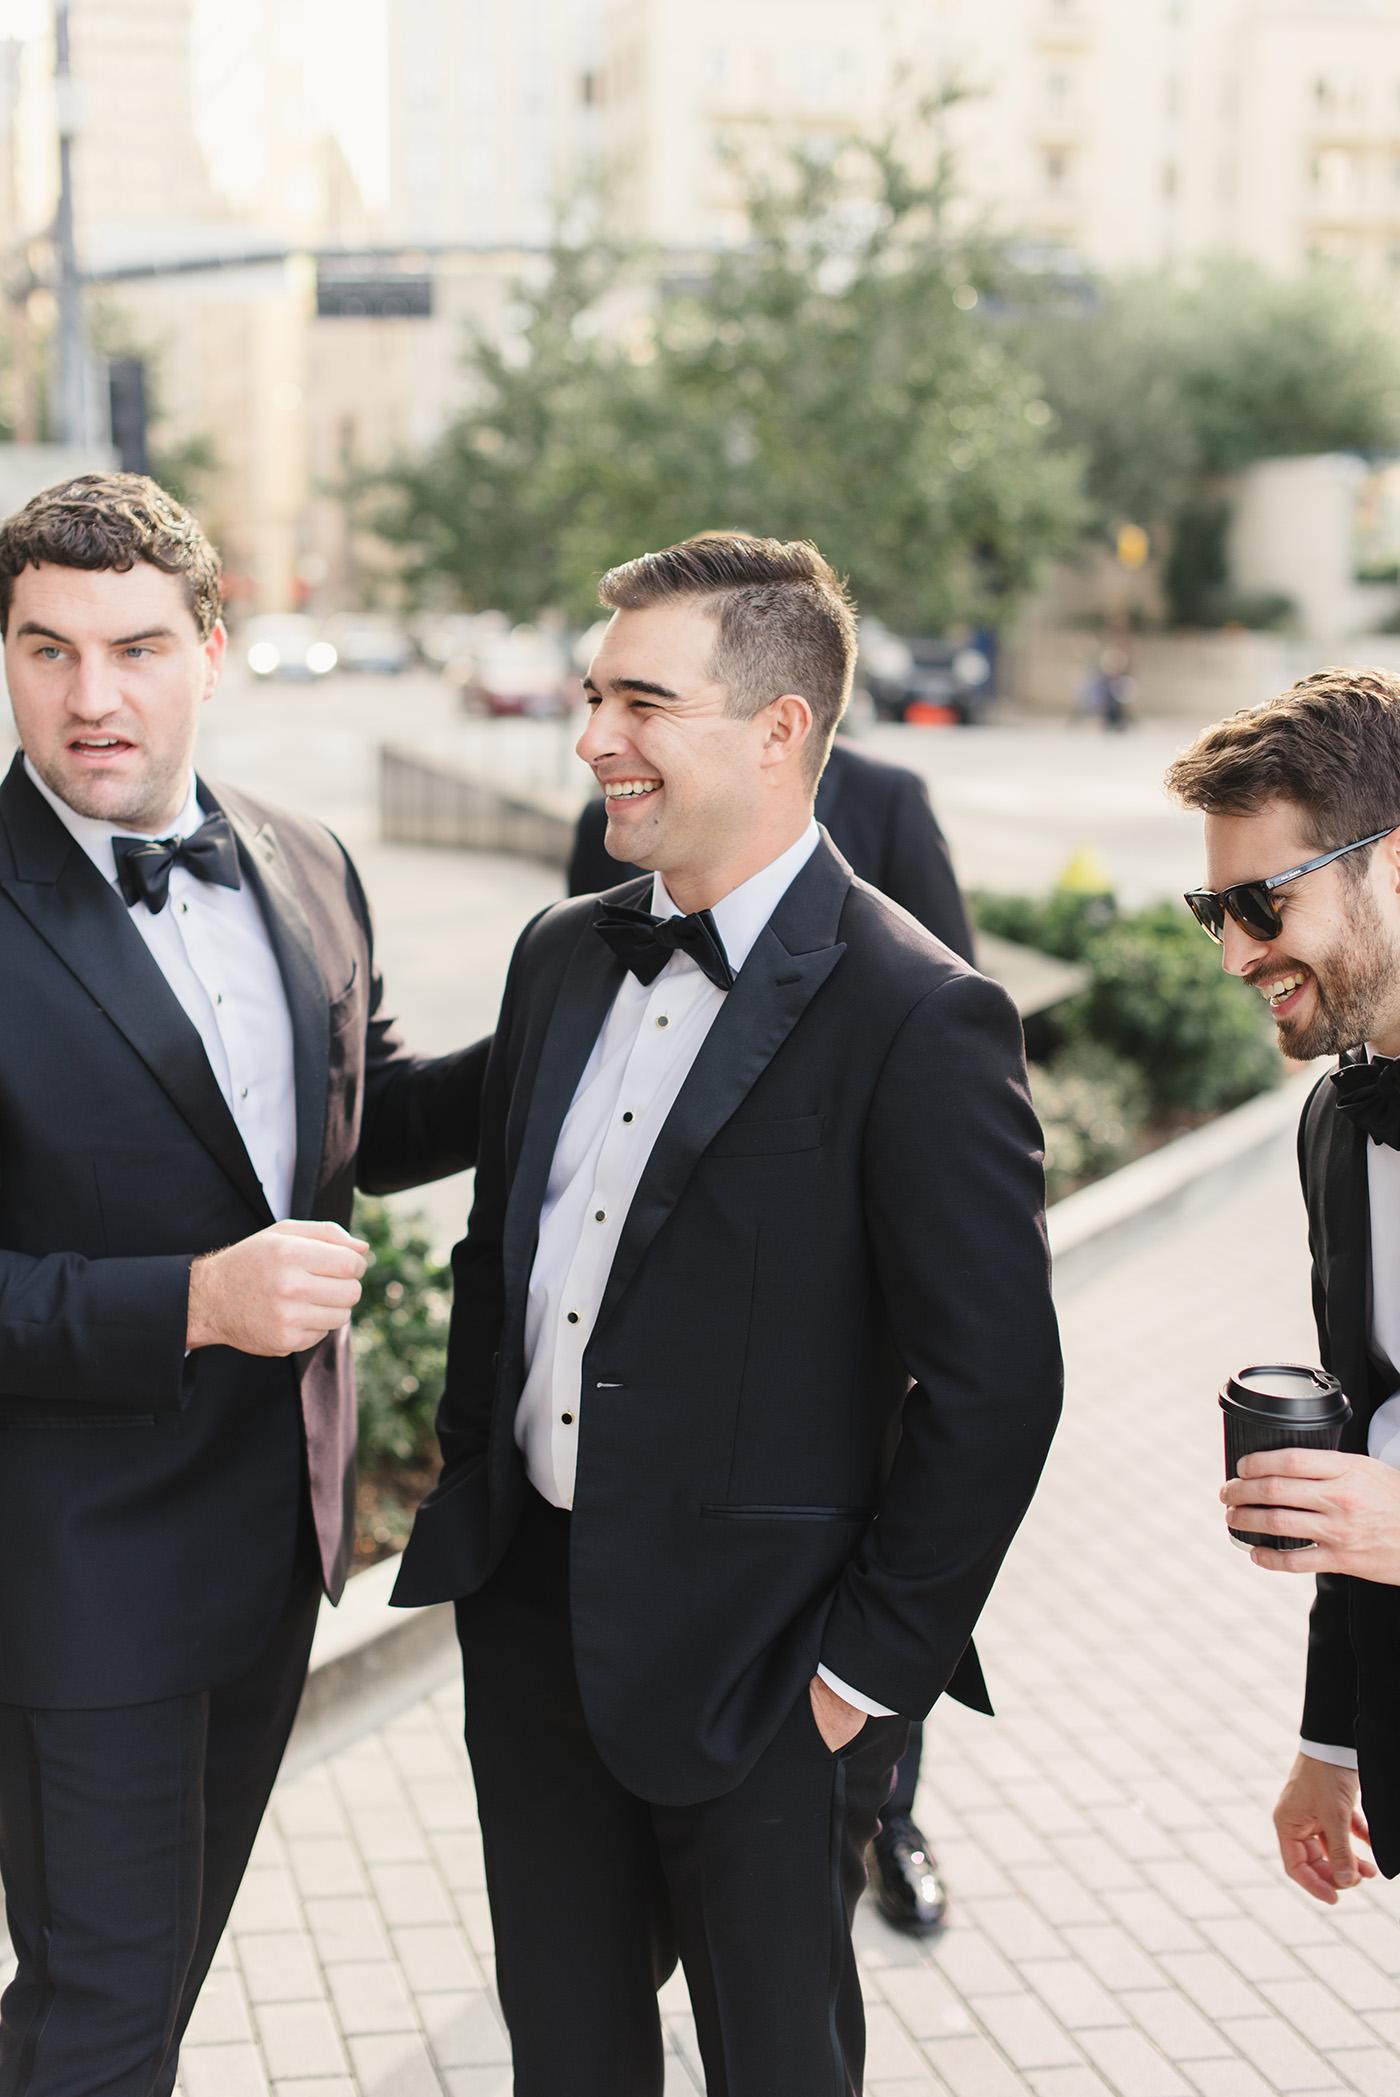 Dallas Wedding Planner - Winter Wedding at The Room on Main - Allday Events - 57.jpg